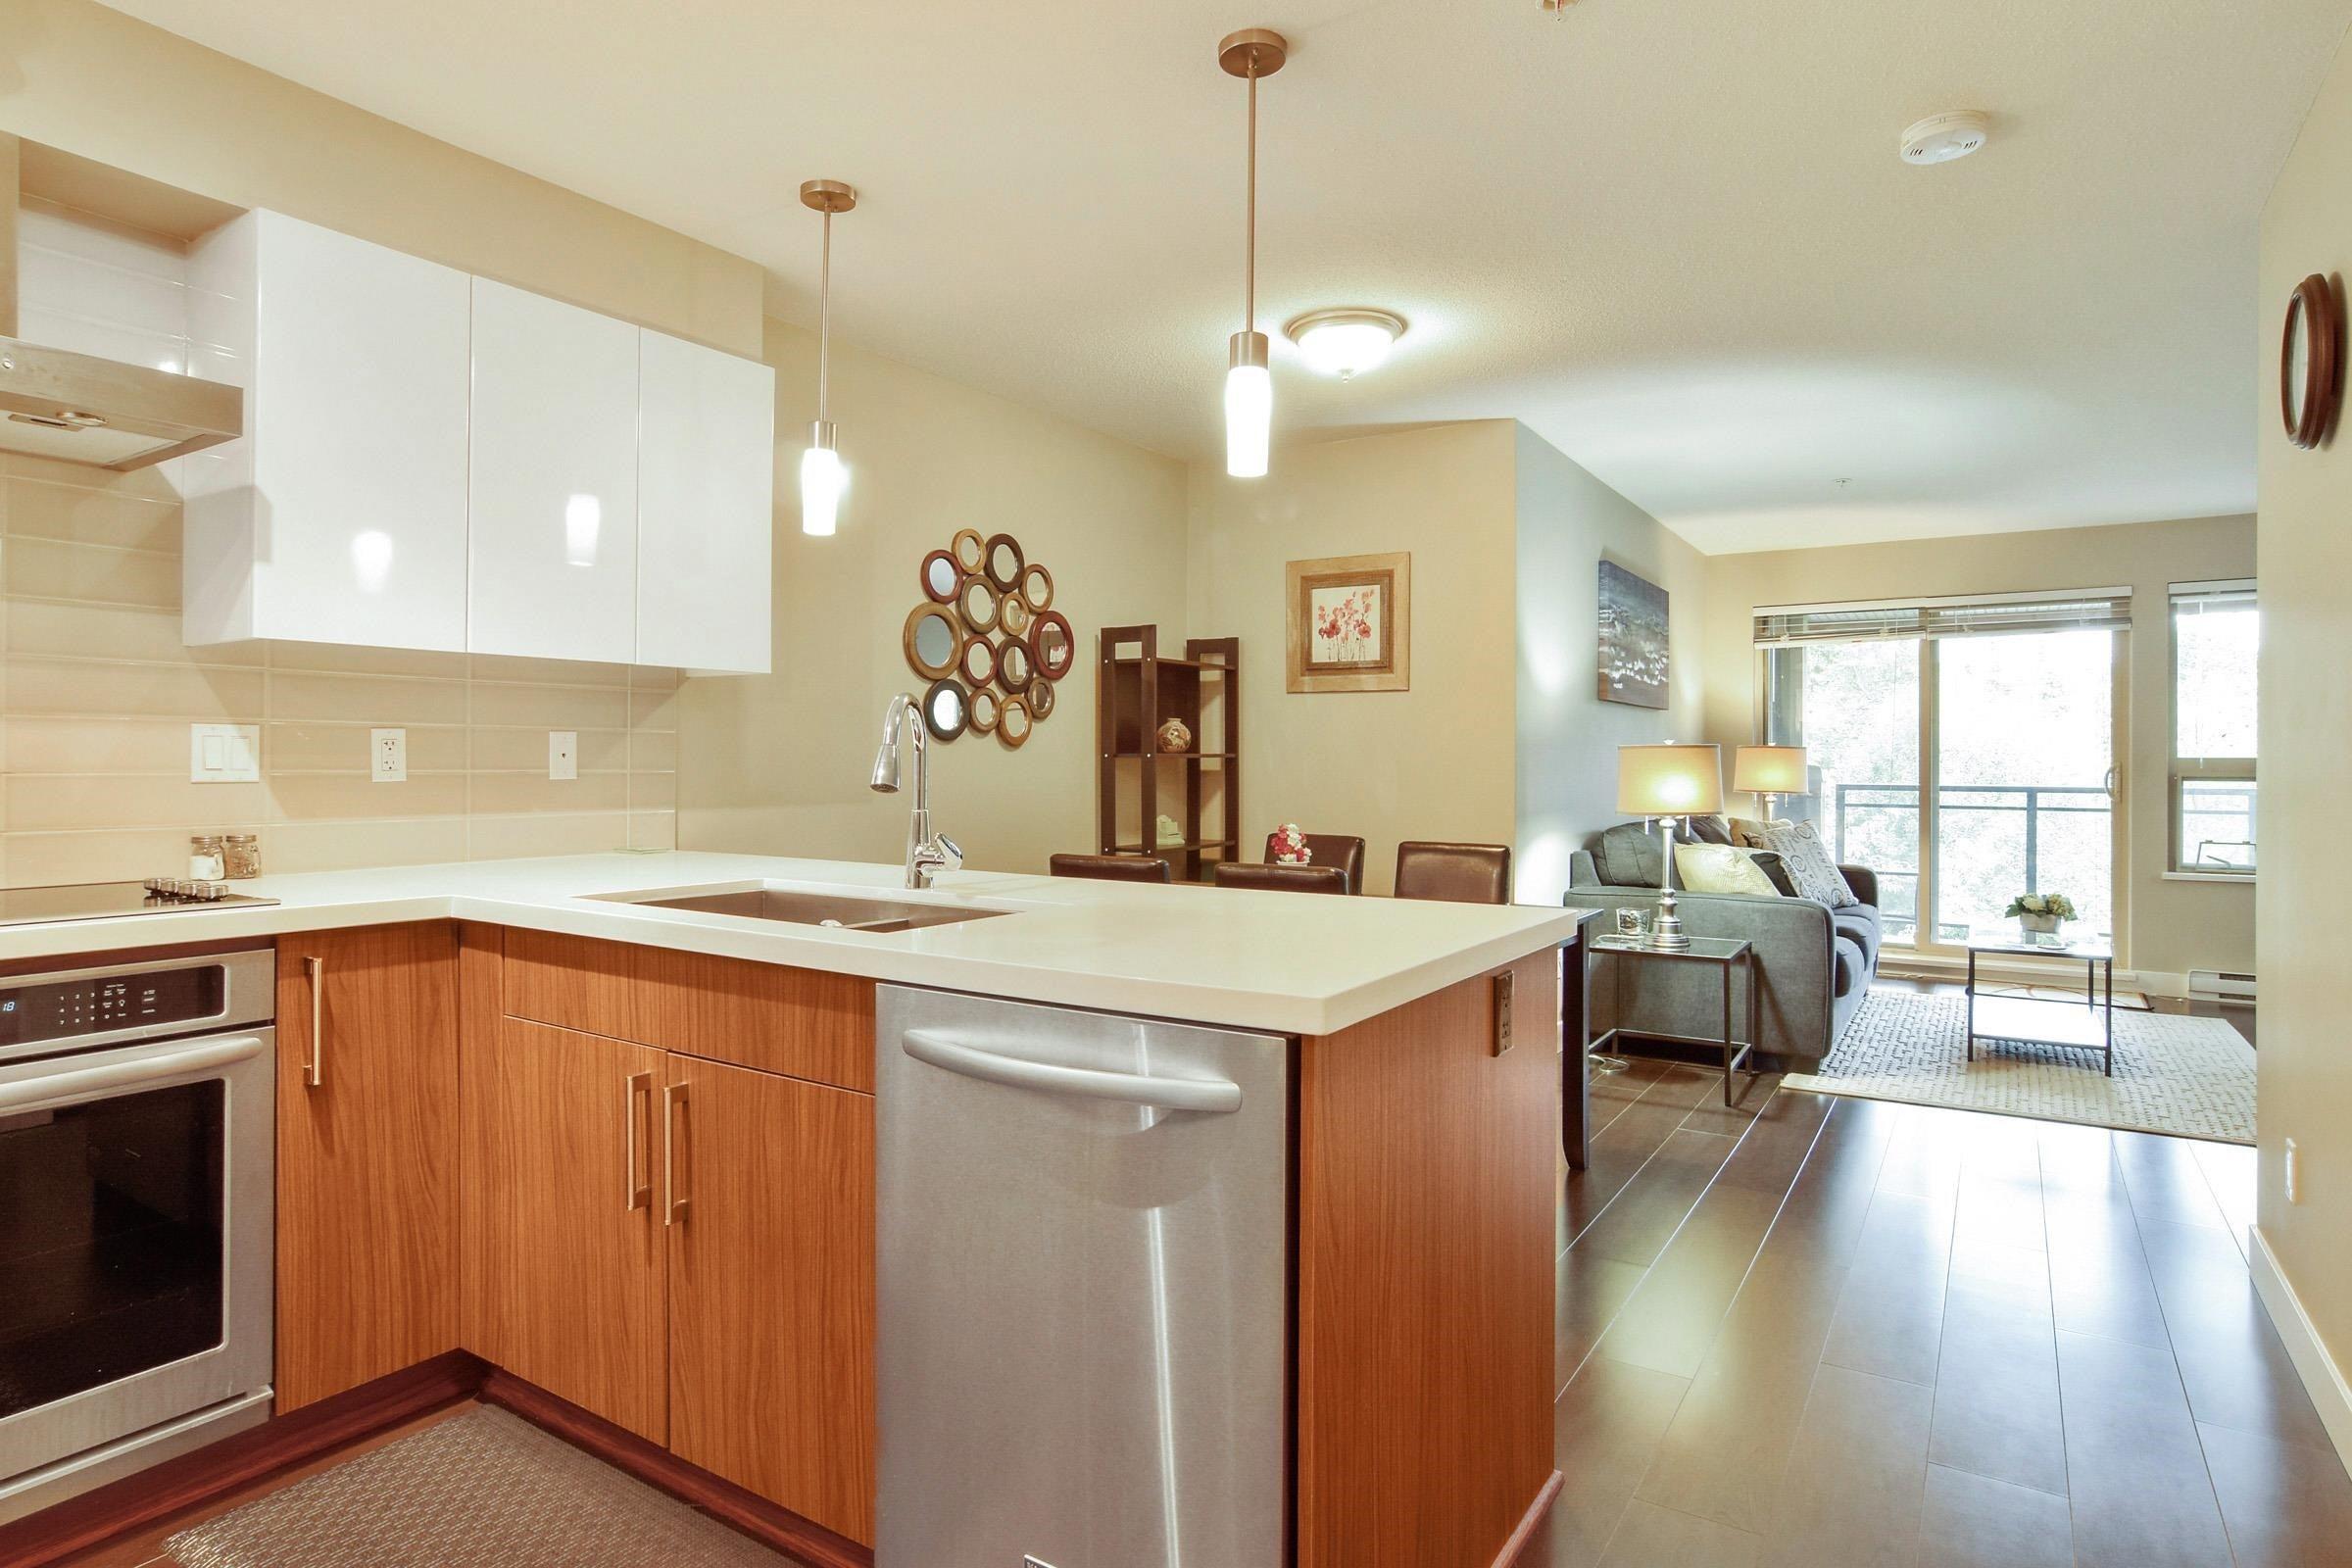 301 7131 STRIDE AVENUE - Edmonds BE Apartment/Condo for sale, 1 Bedroom (R2625669) - #7